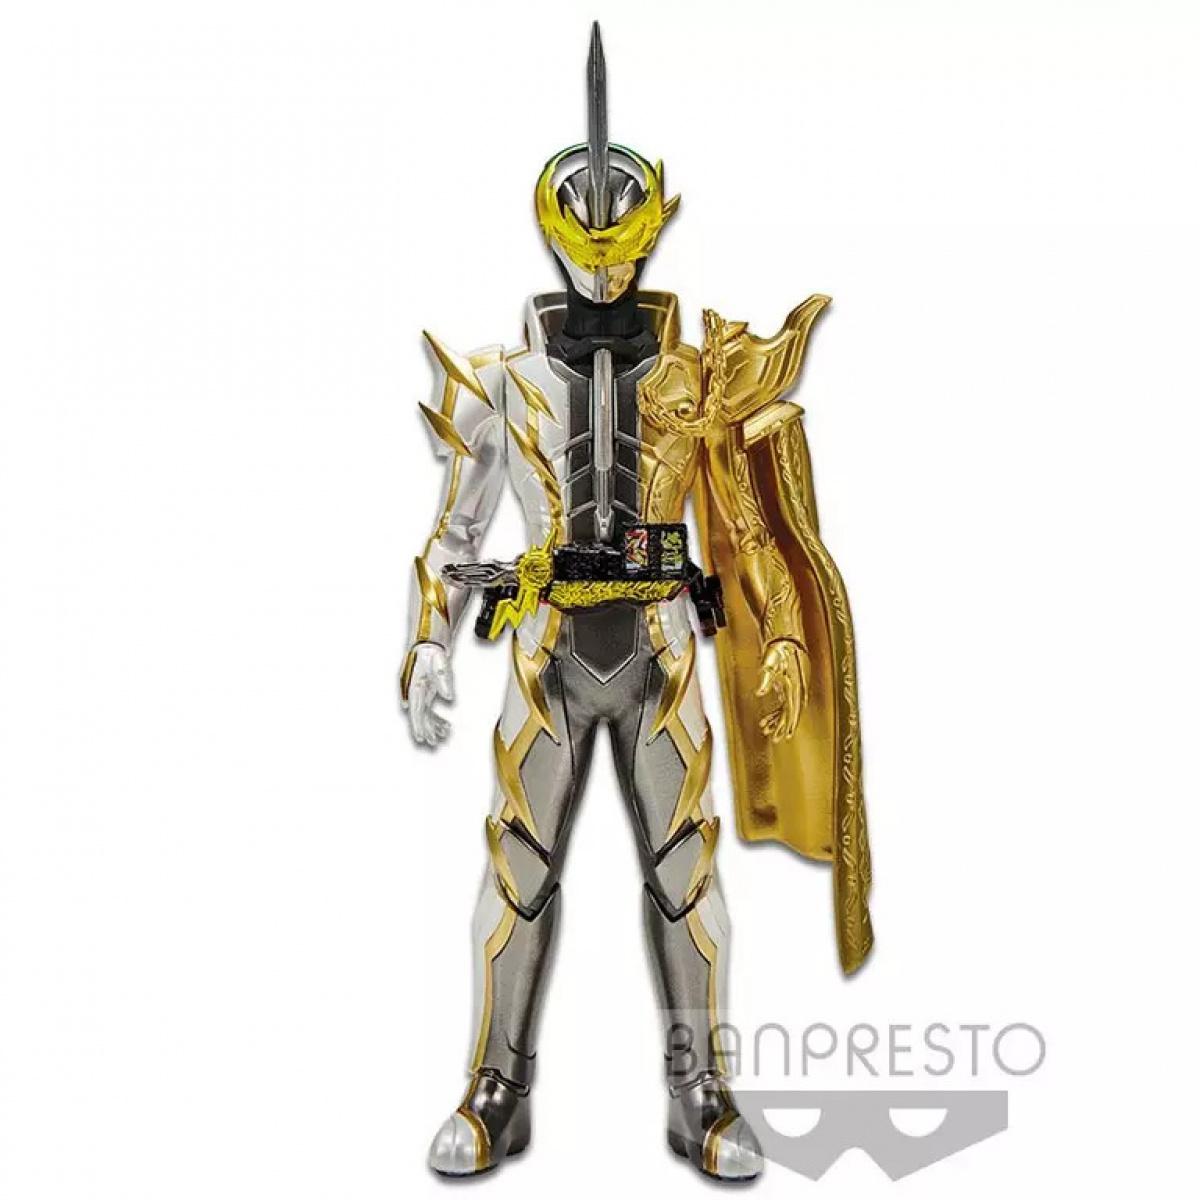 Kamen Rider Saber Kamen Rider Espada Lamp Do Alagina Prize Figure Figures 4